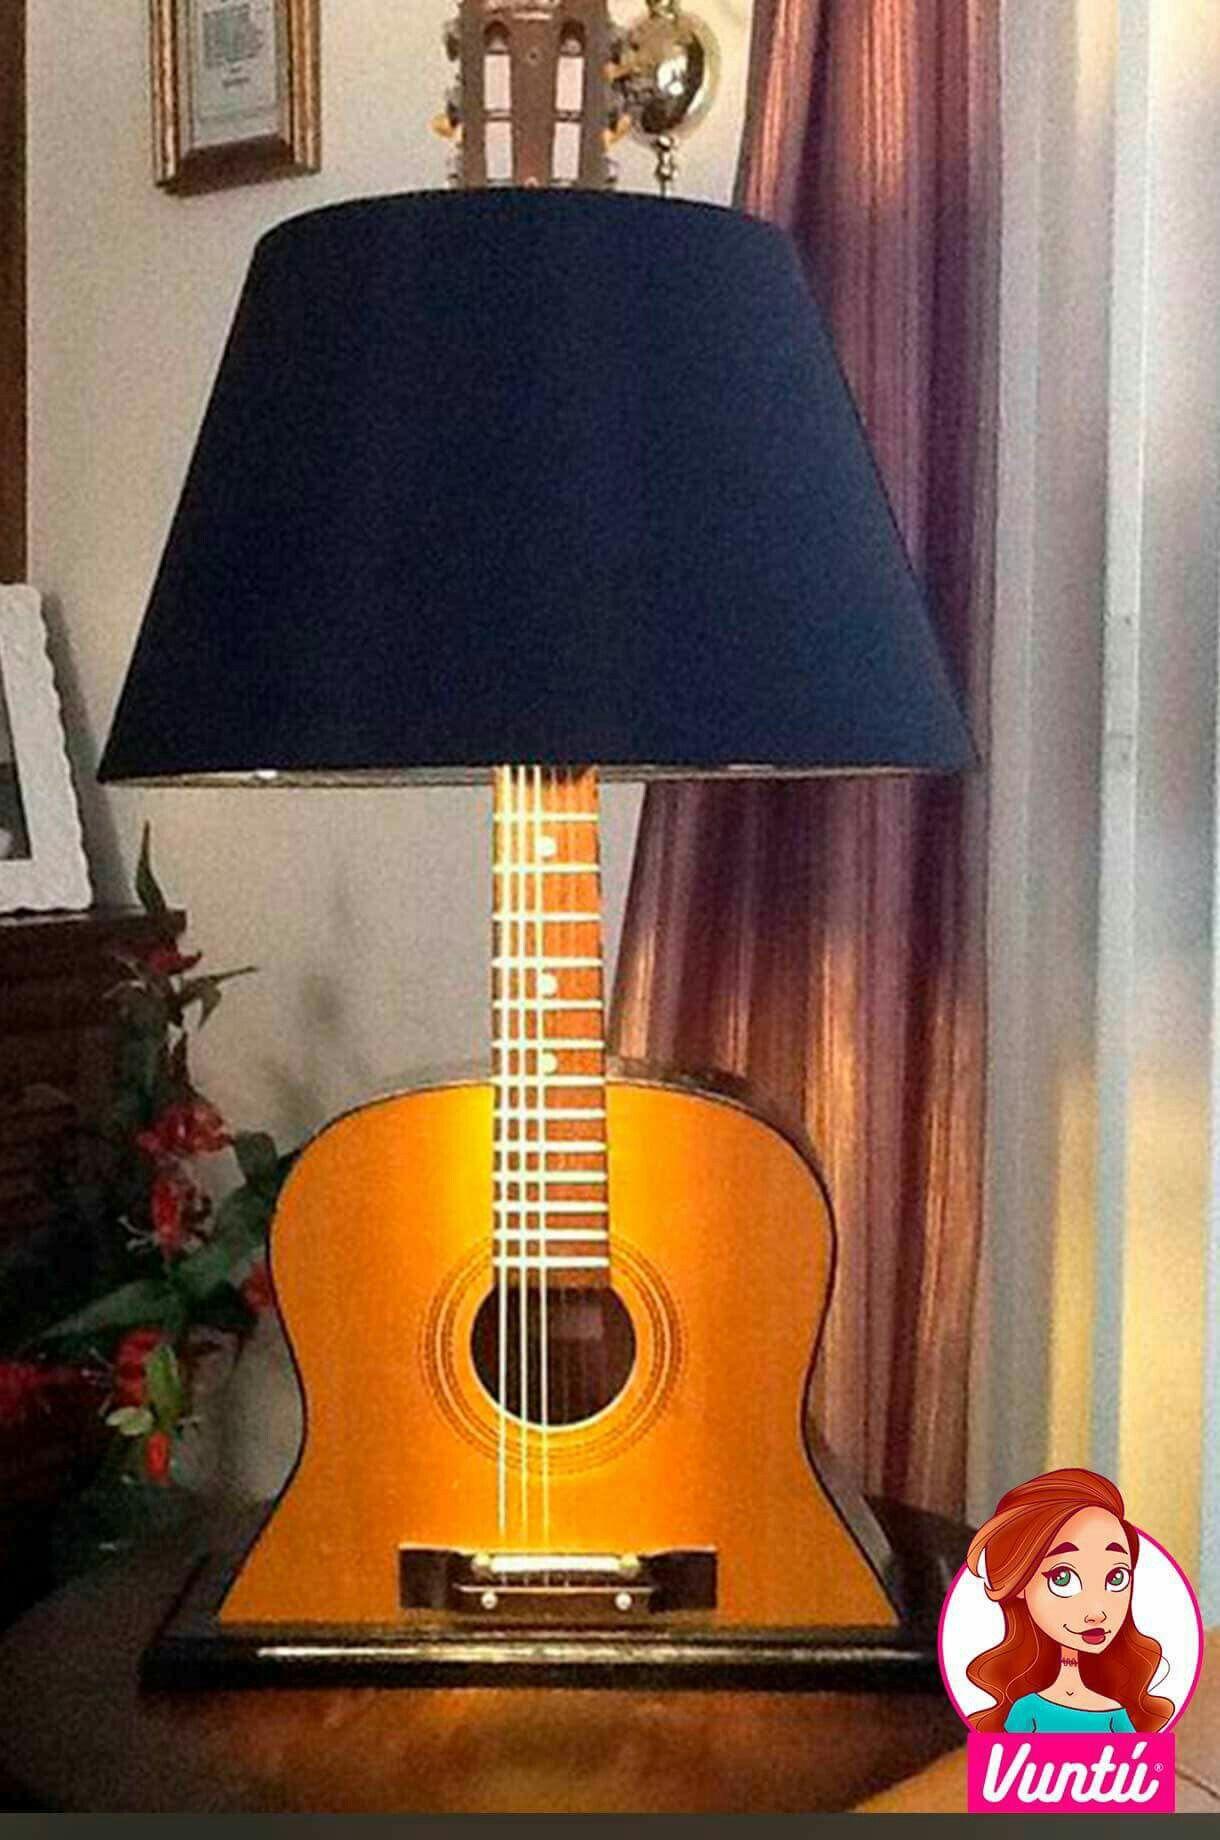 guitarra de in Lámpara 2019LightingRepurposed furniture UVMqpzGLS